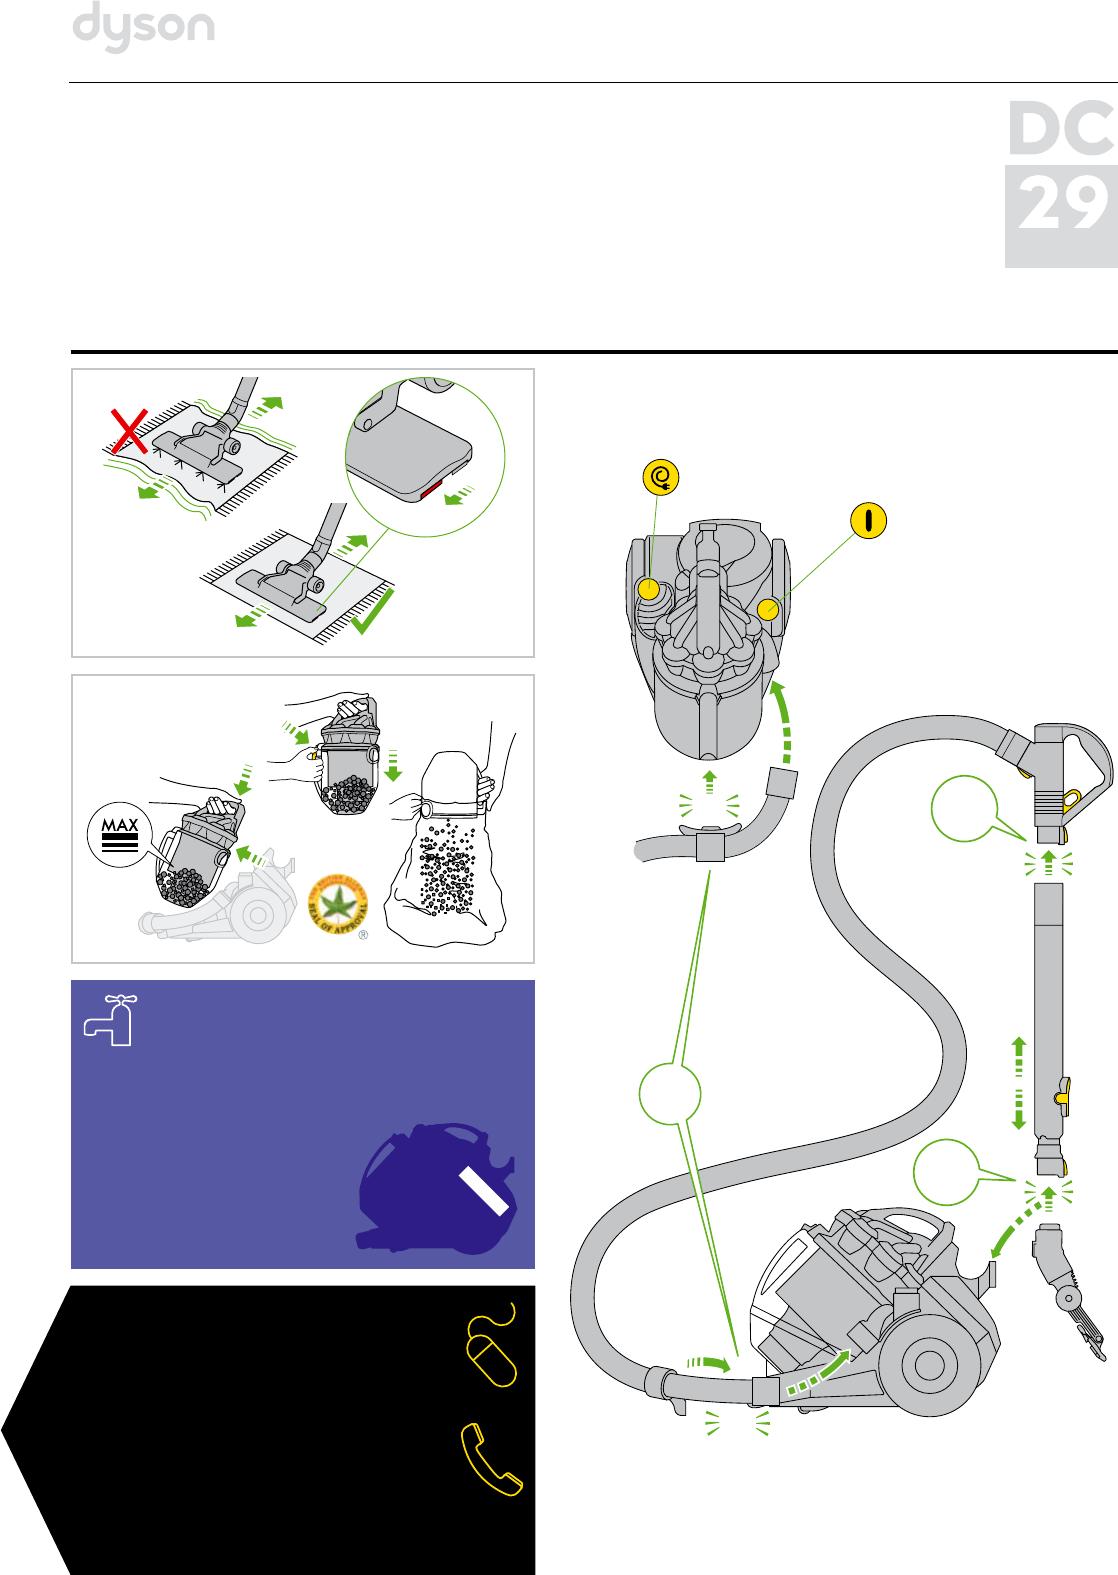 dyson ds29 инструкция